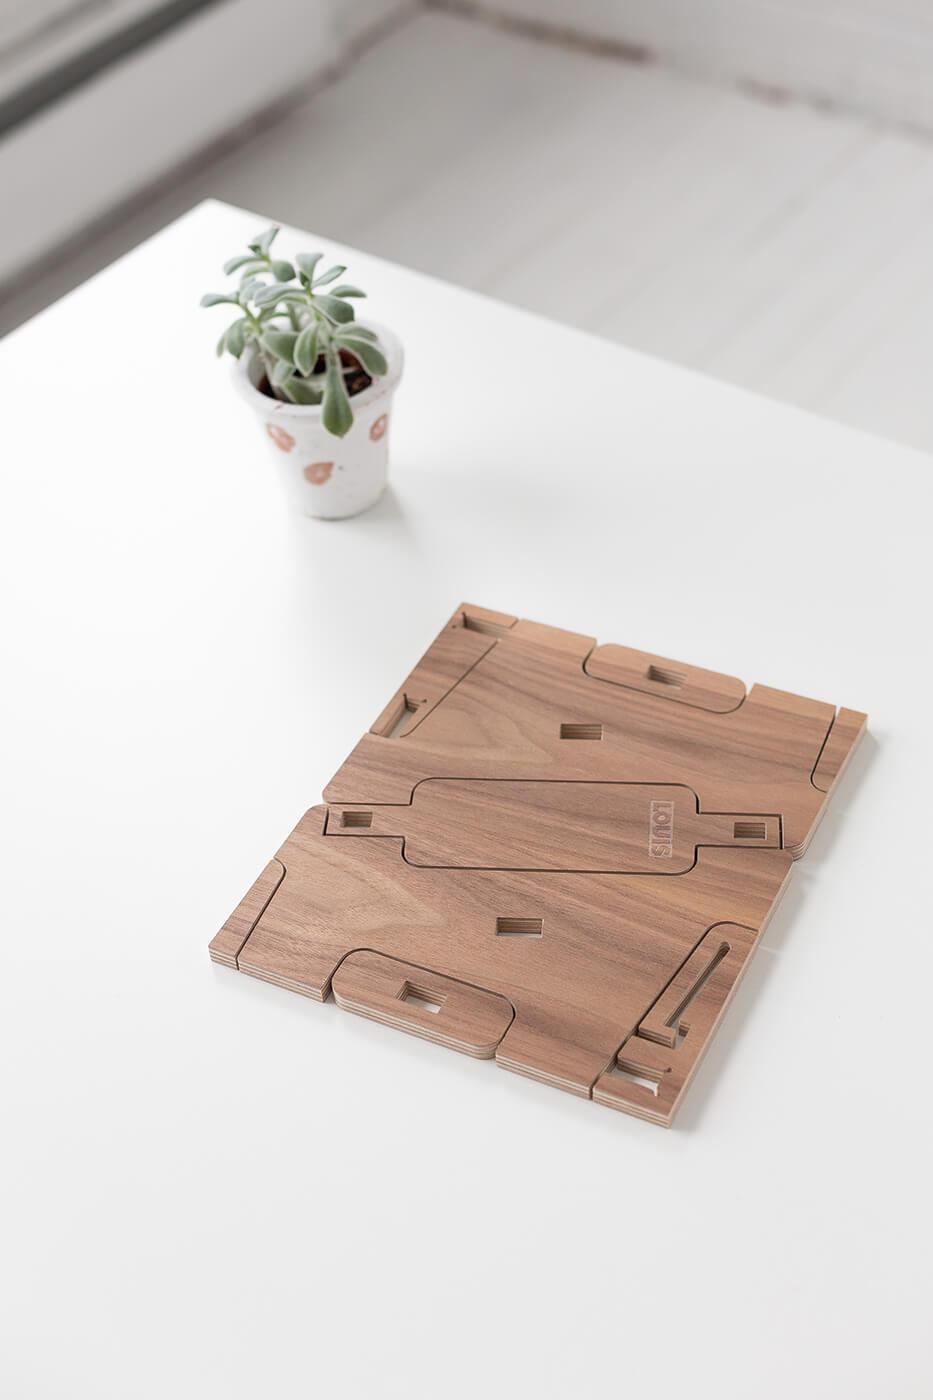 Louis-Walnut-Puzzle.jpg